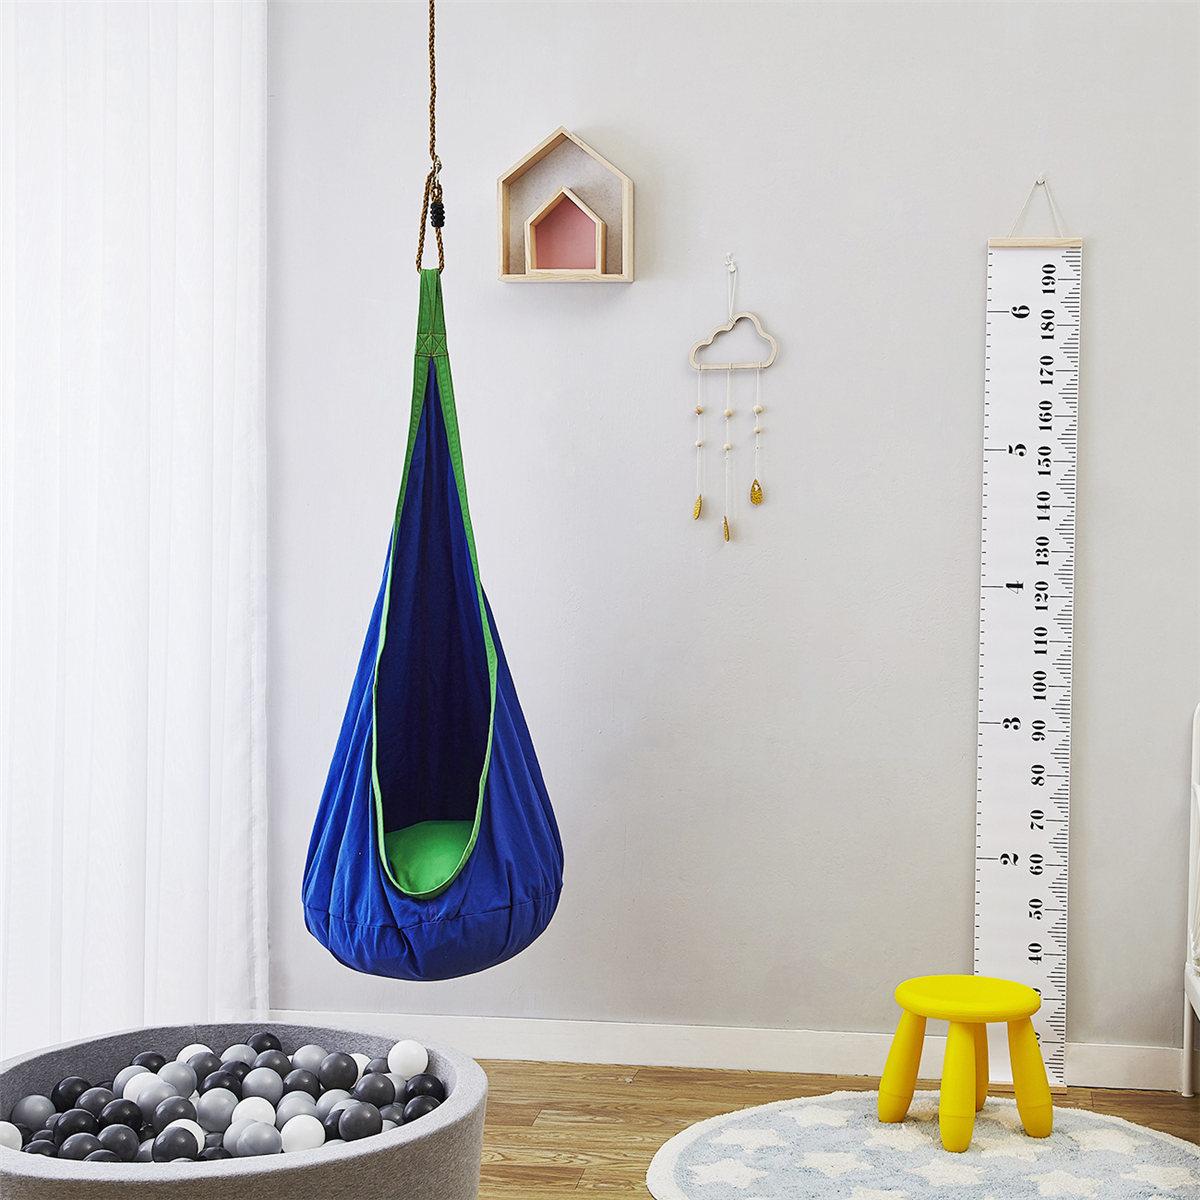 Comfortable Baby Kid Swing Hammock Hanging Chair Camping Bed Portable Children Indoor Pod Swing Garden Furniture Outdoor Hammock цена